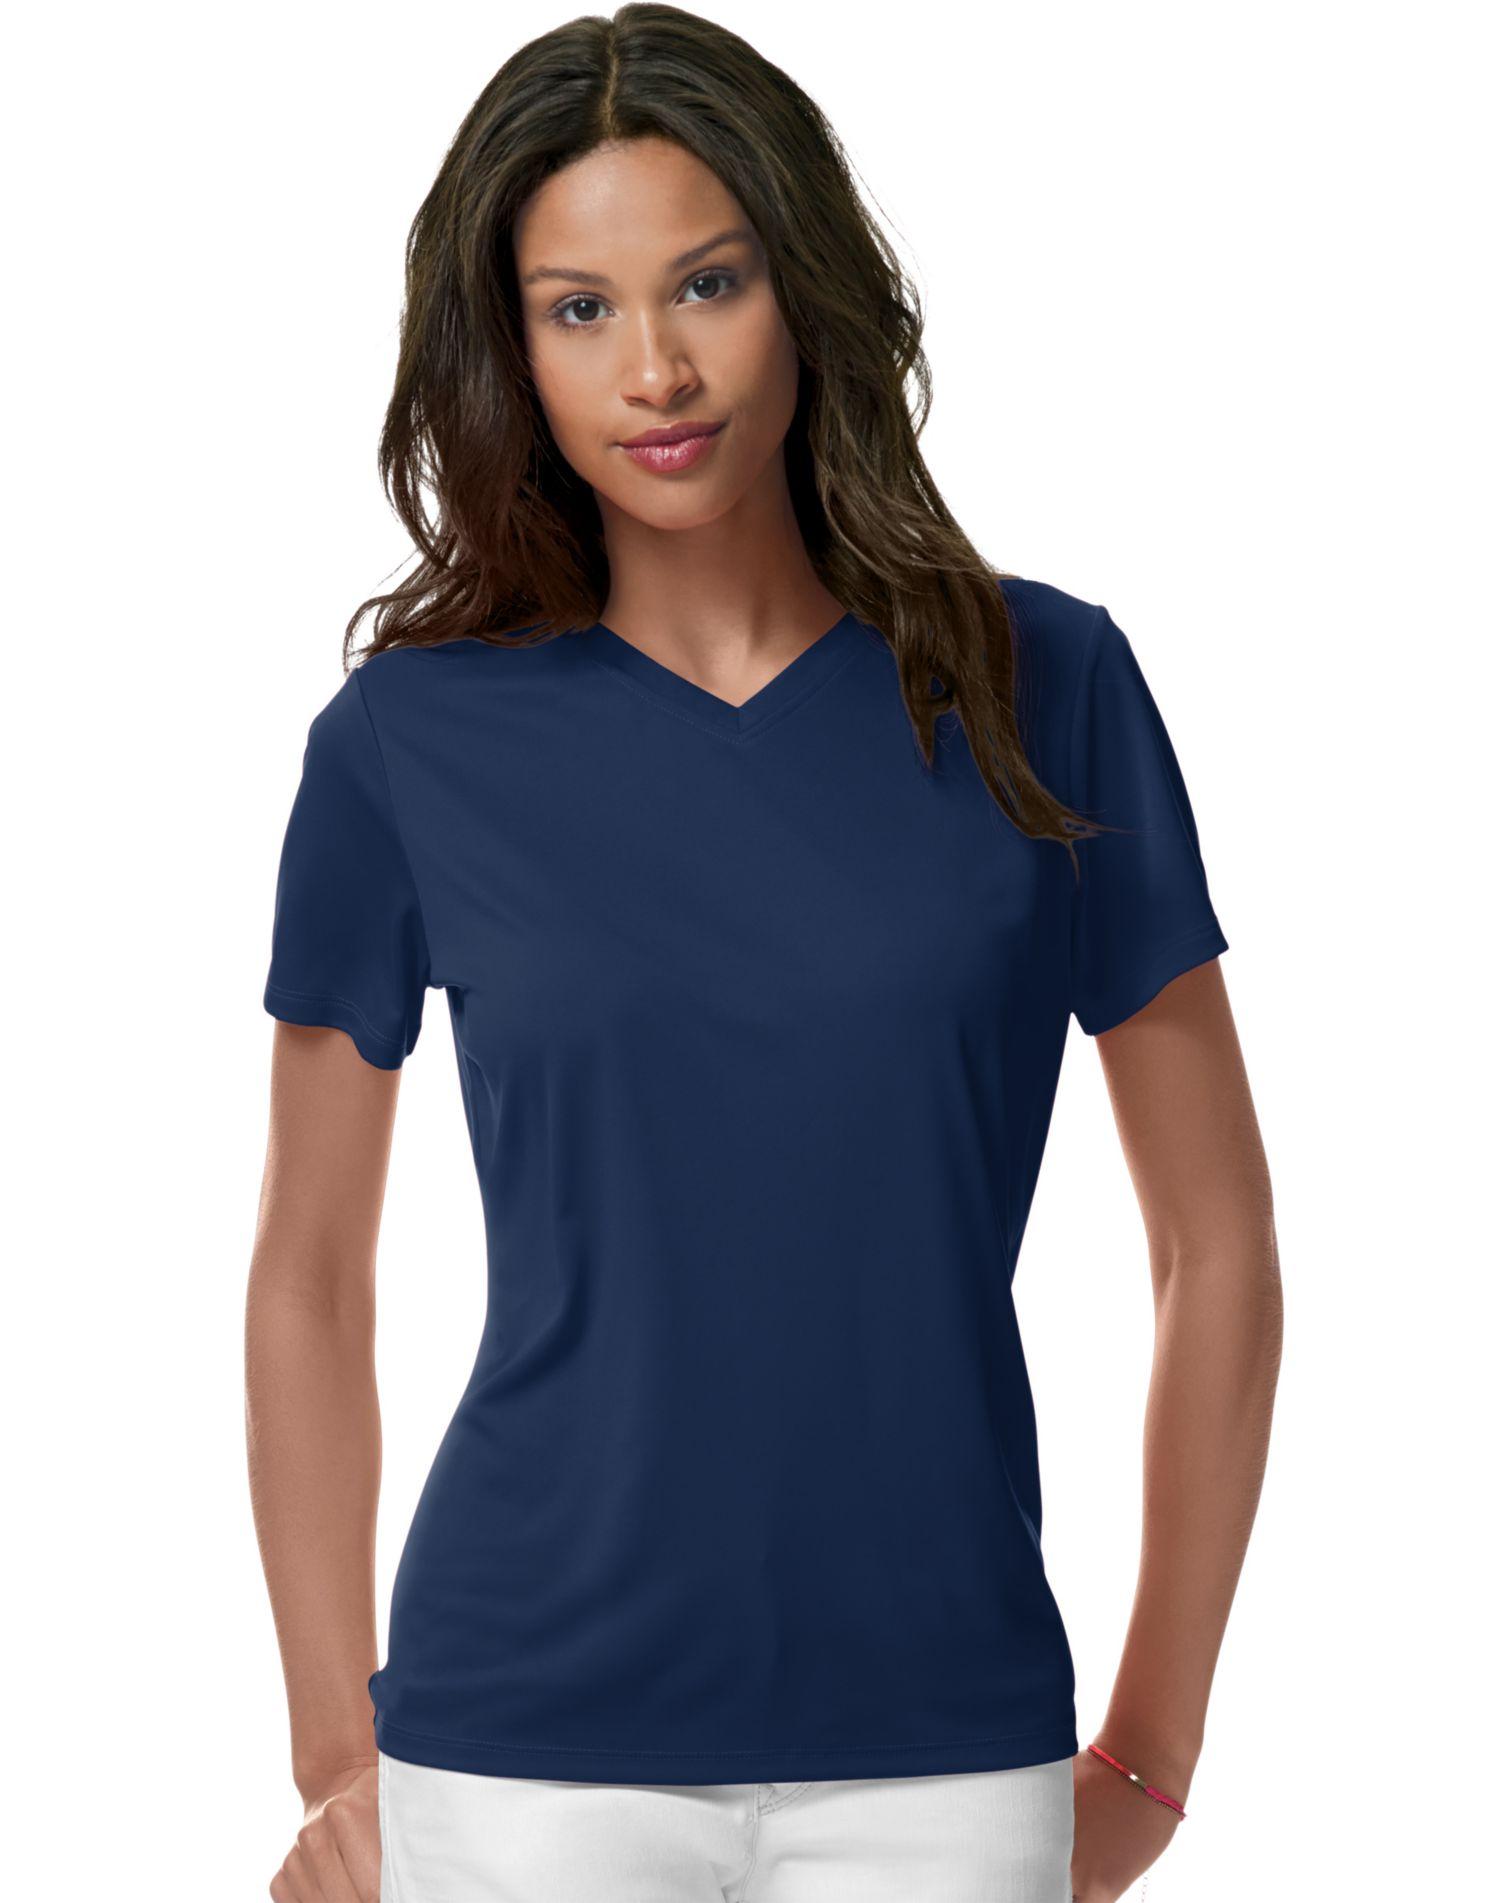 Hanes women s cool dri v neck t shirt for Womens v neck t shirts